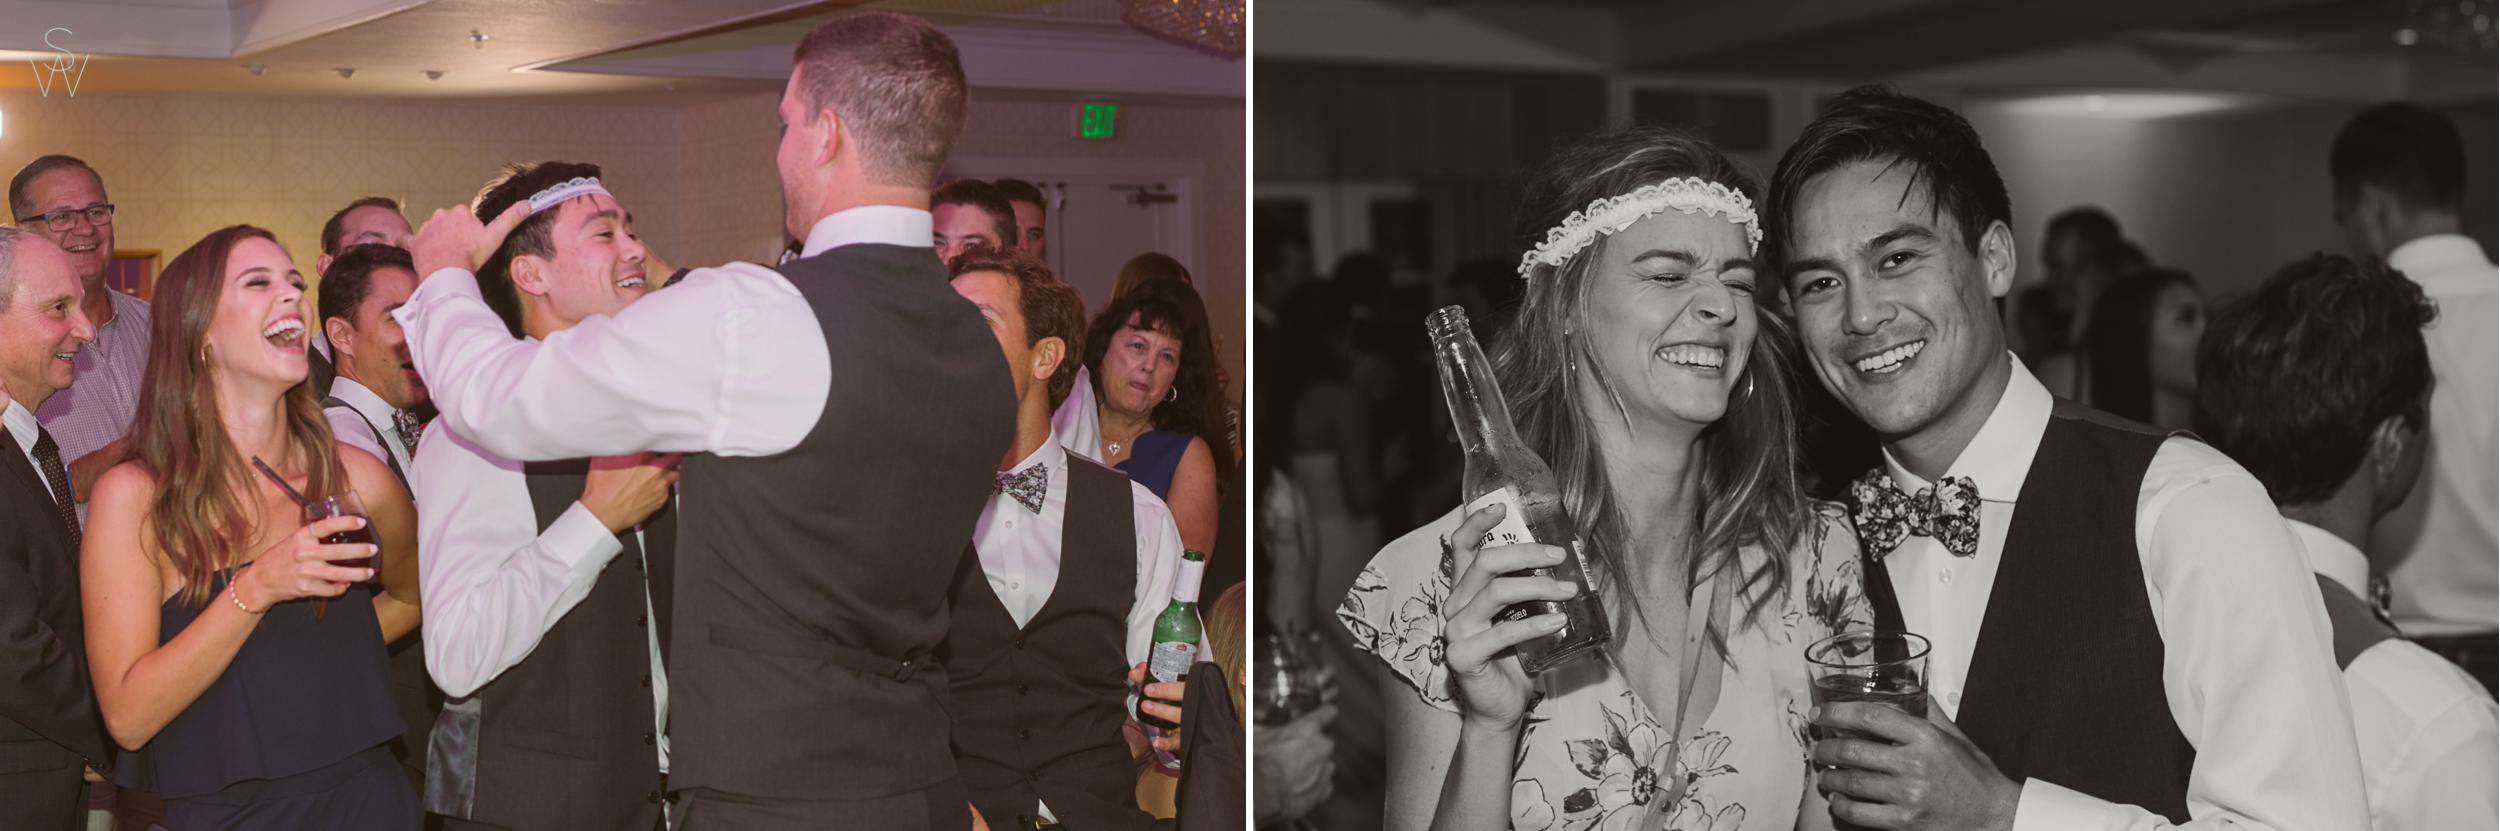 239Lauberge.shewanders.wedding.photography.JPG